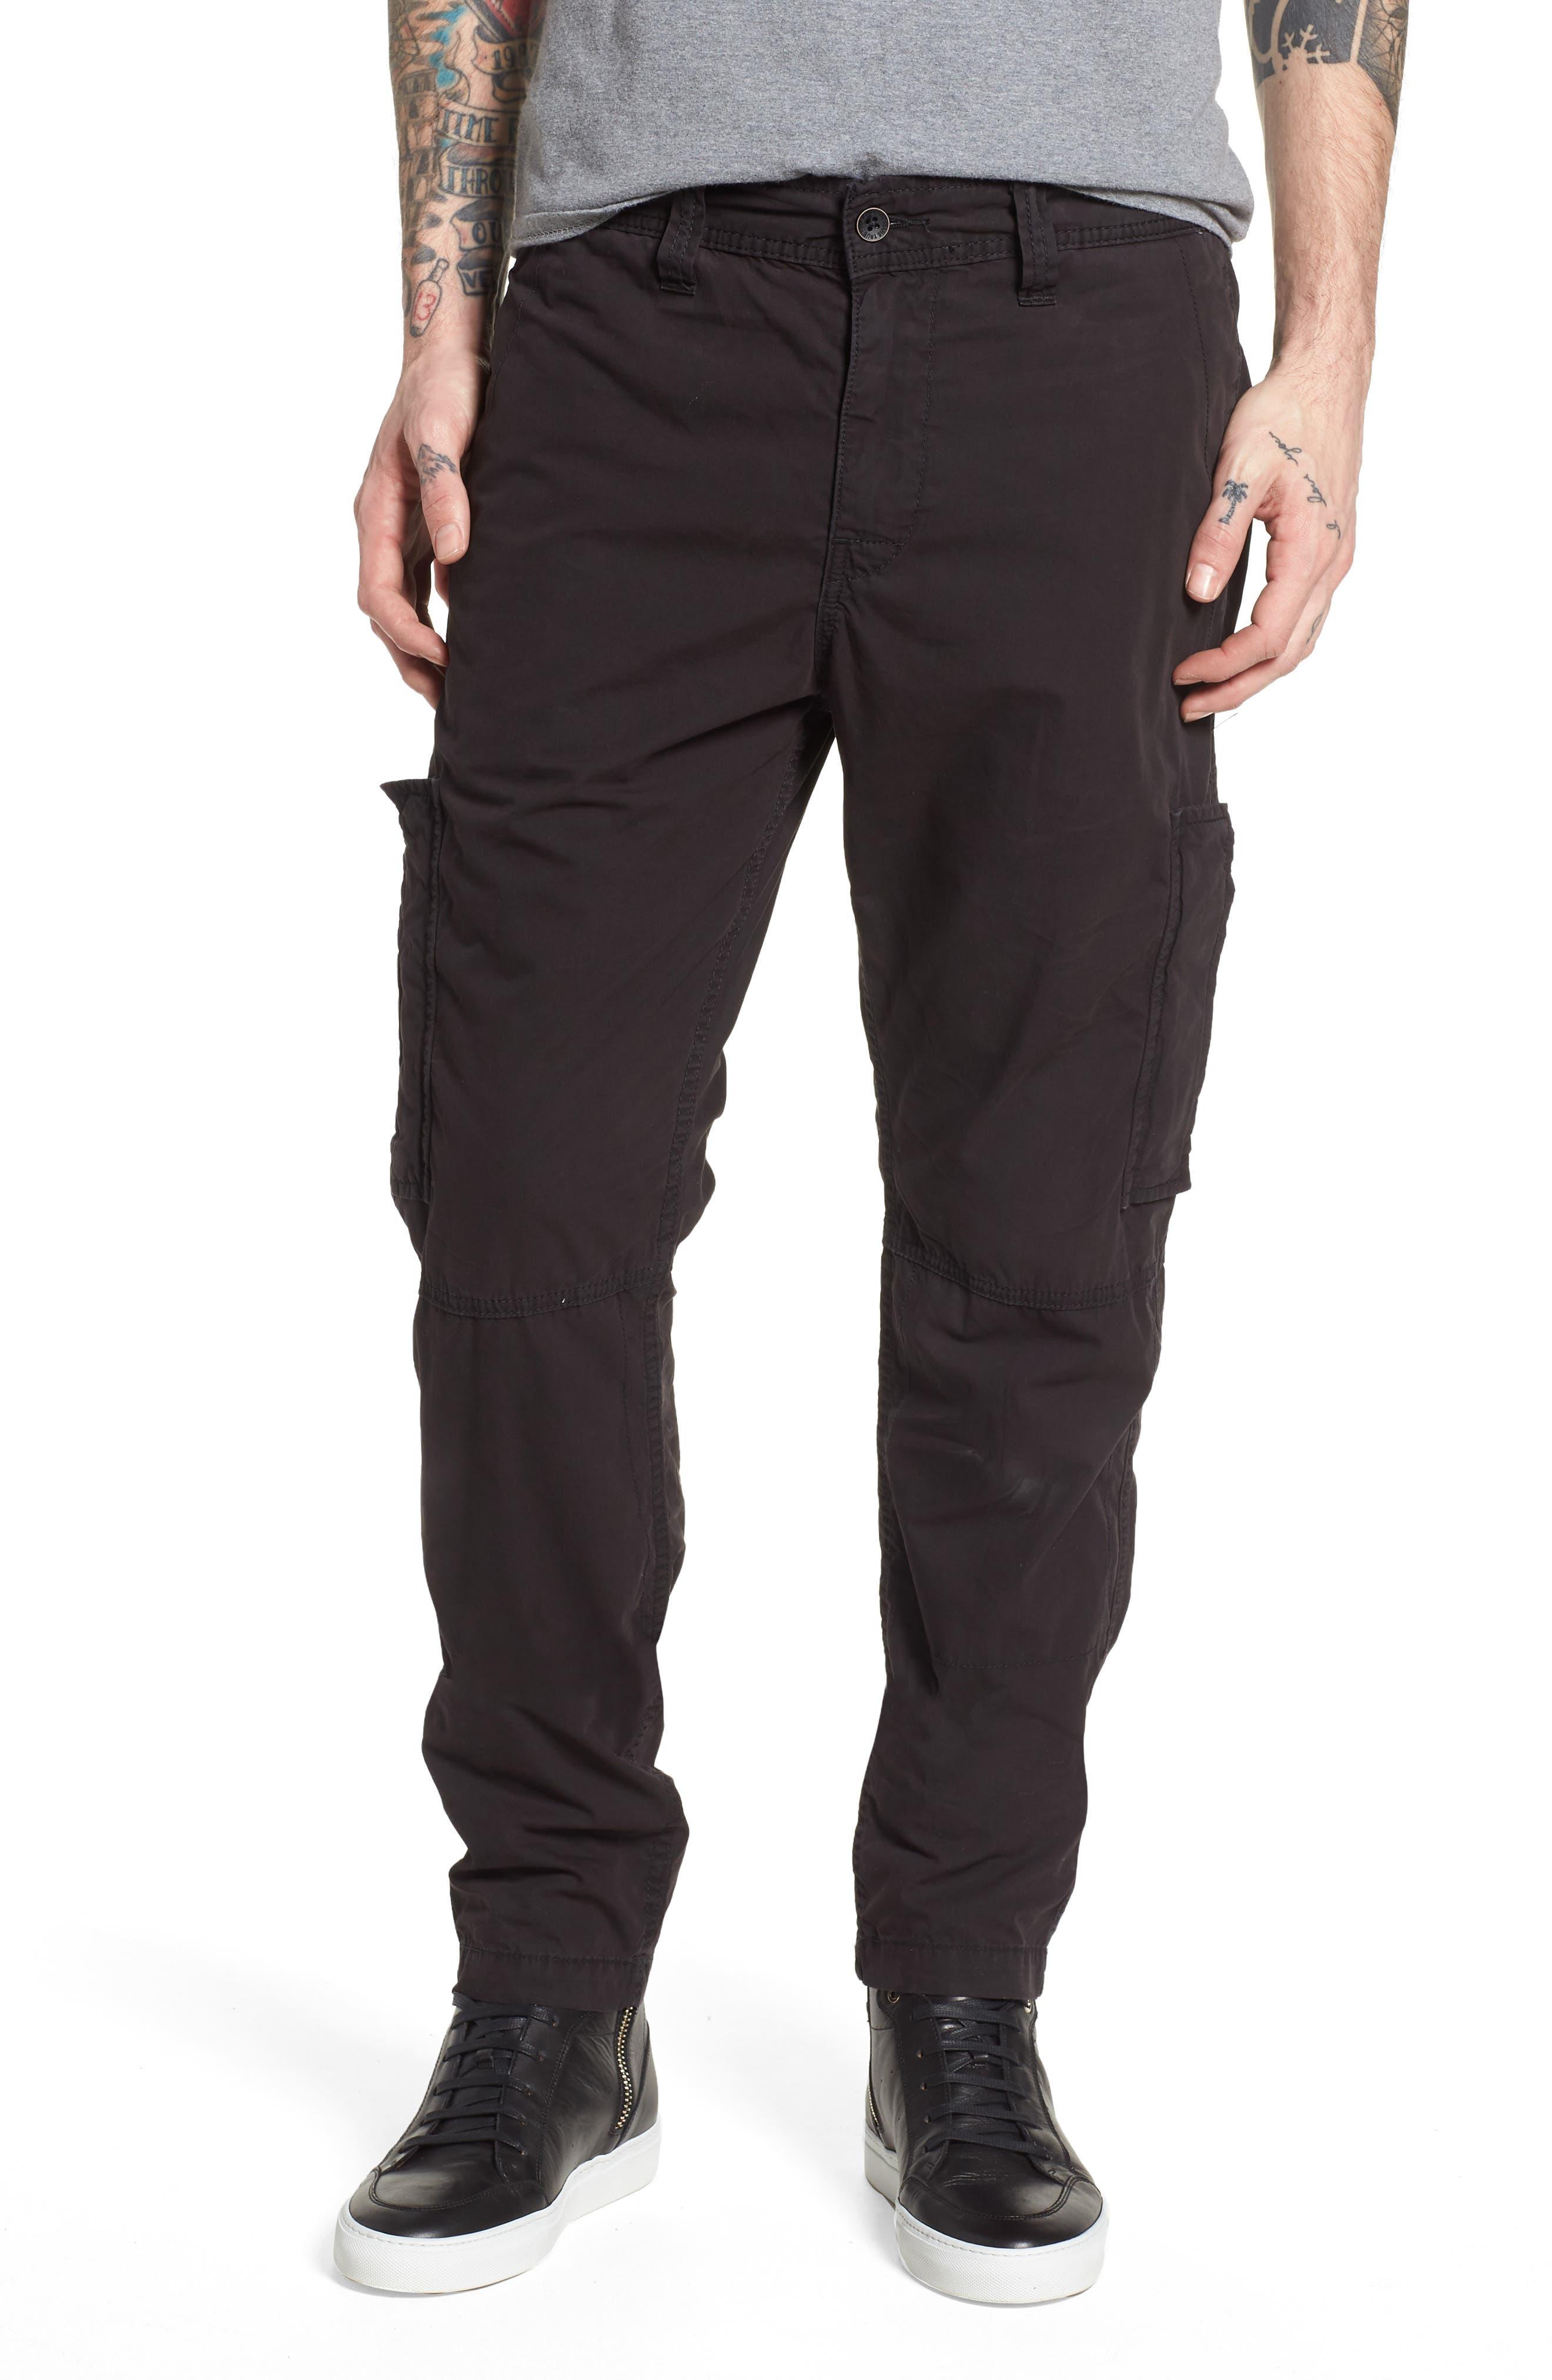 Officer Field Pants,                             Main thumbnail 1, color,                             001